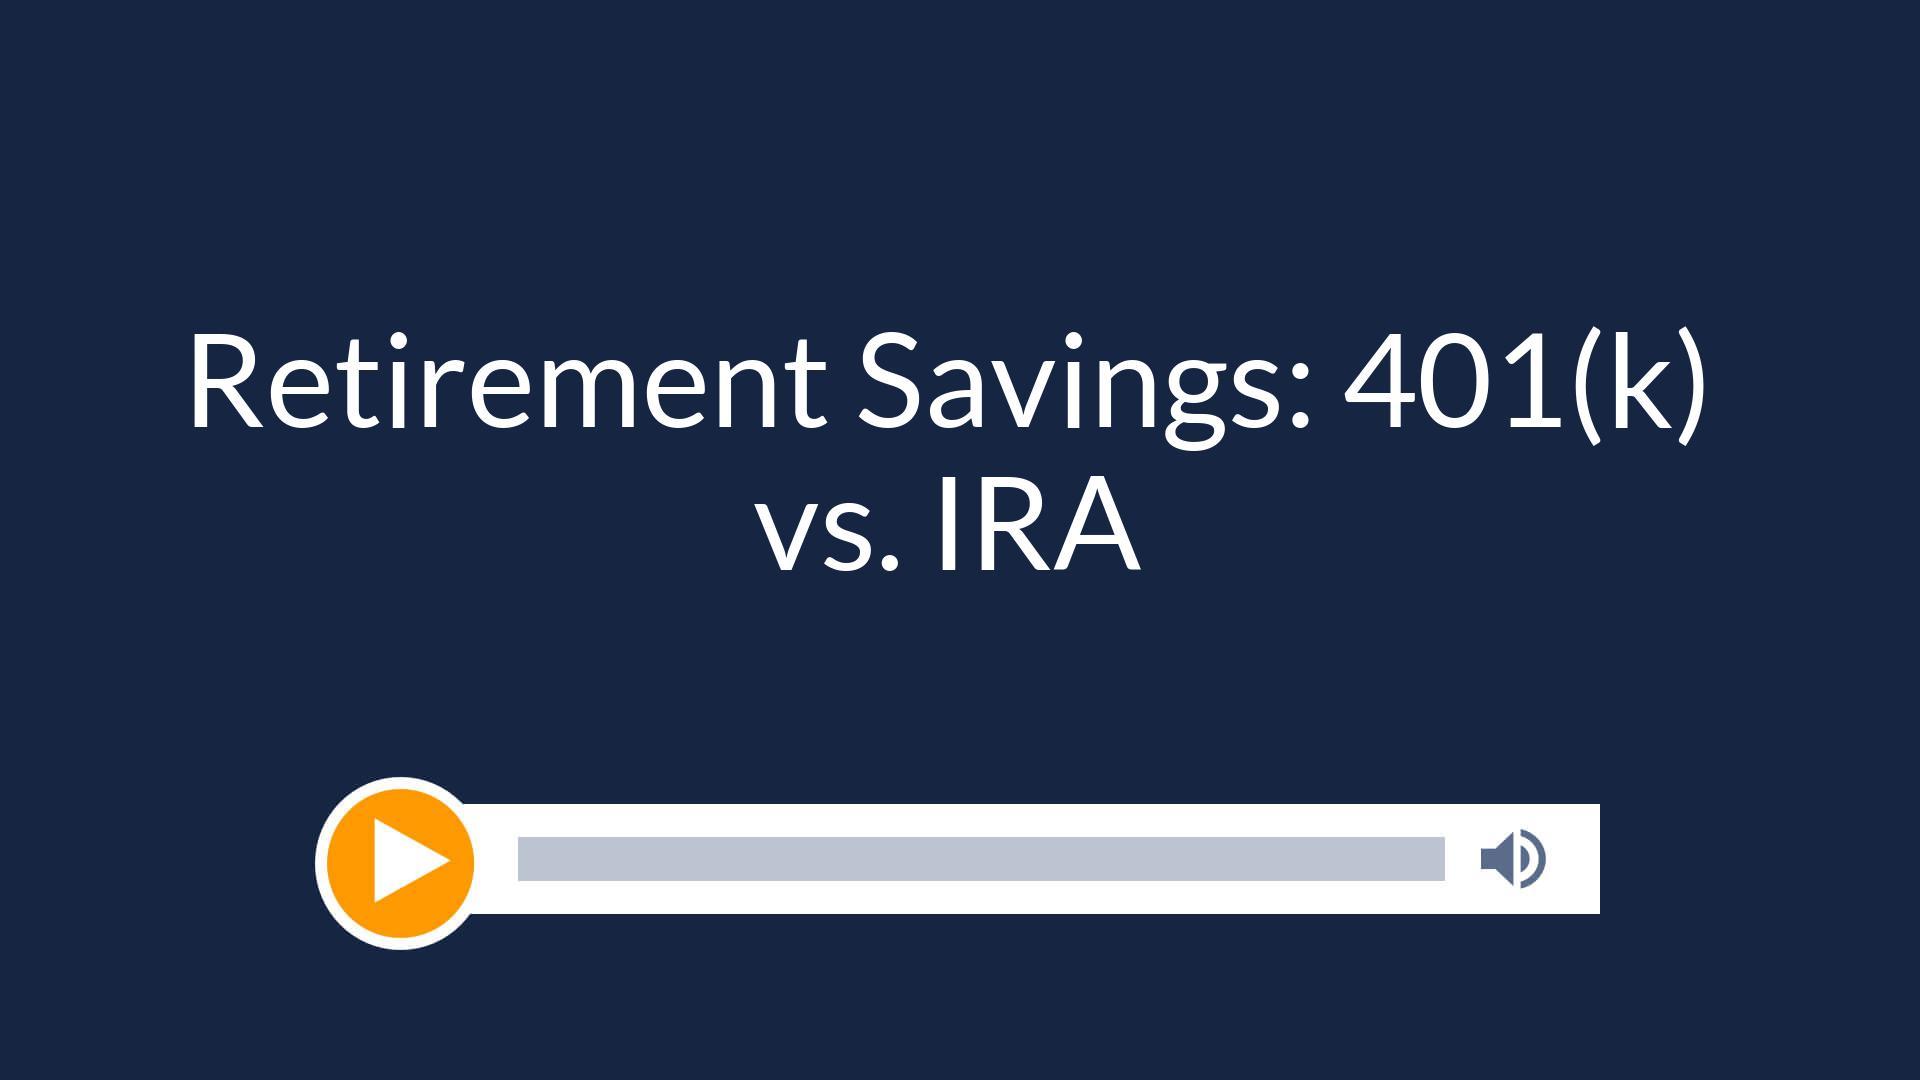 Retirement Savings: 401(k) vs IRA